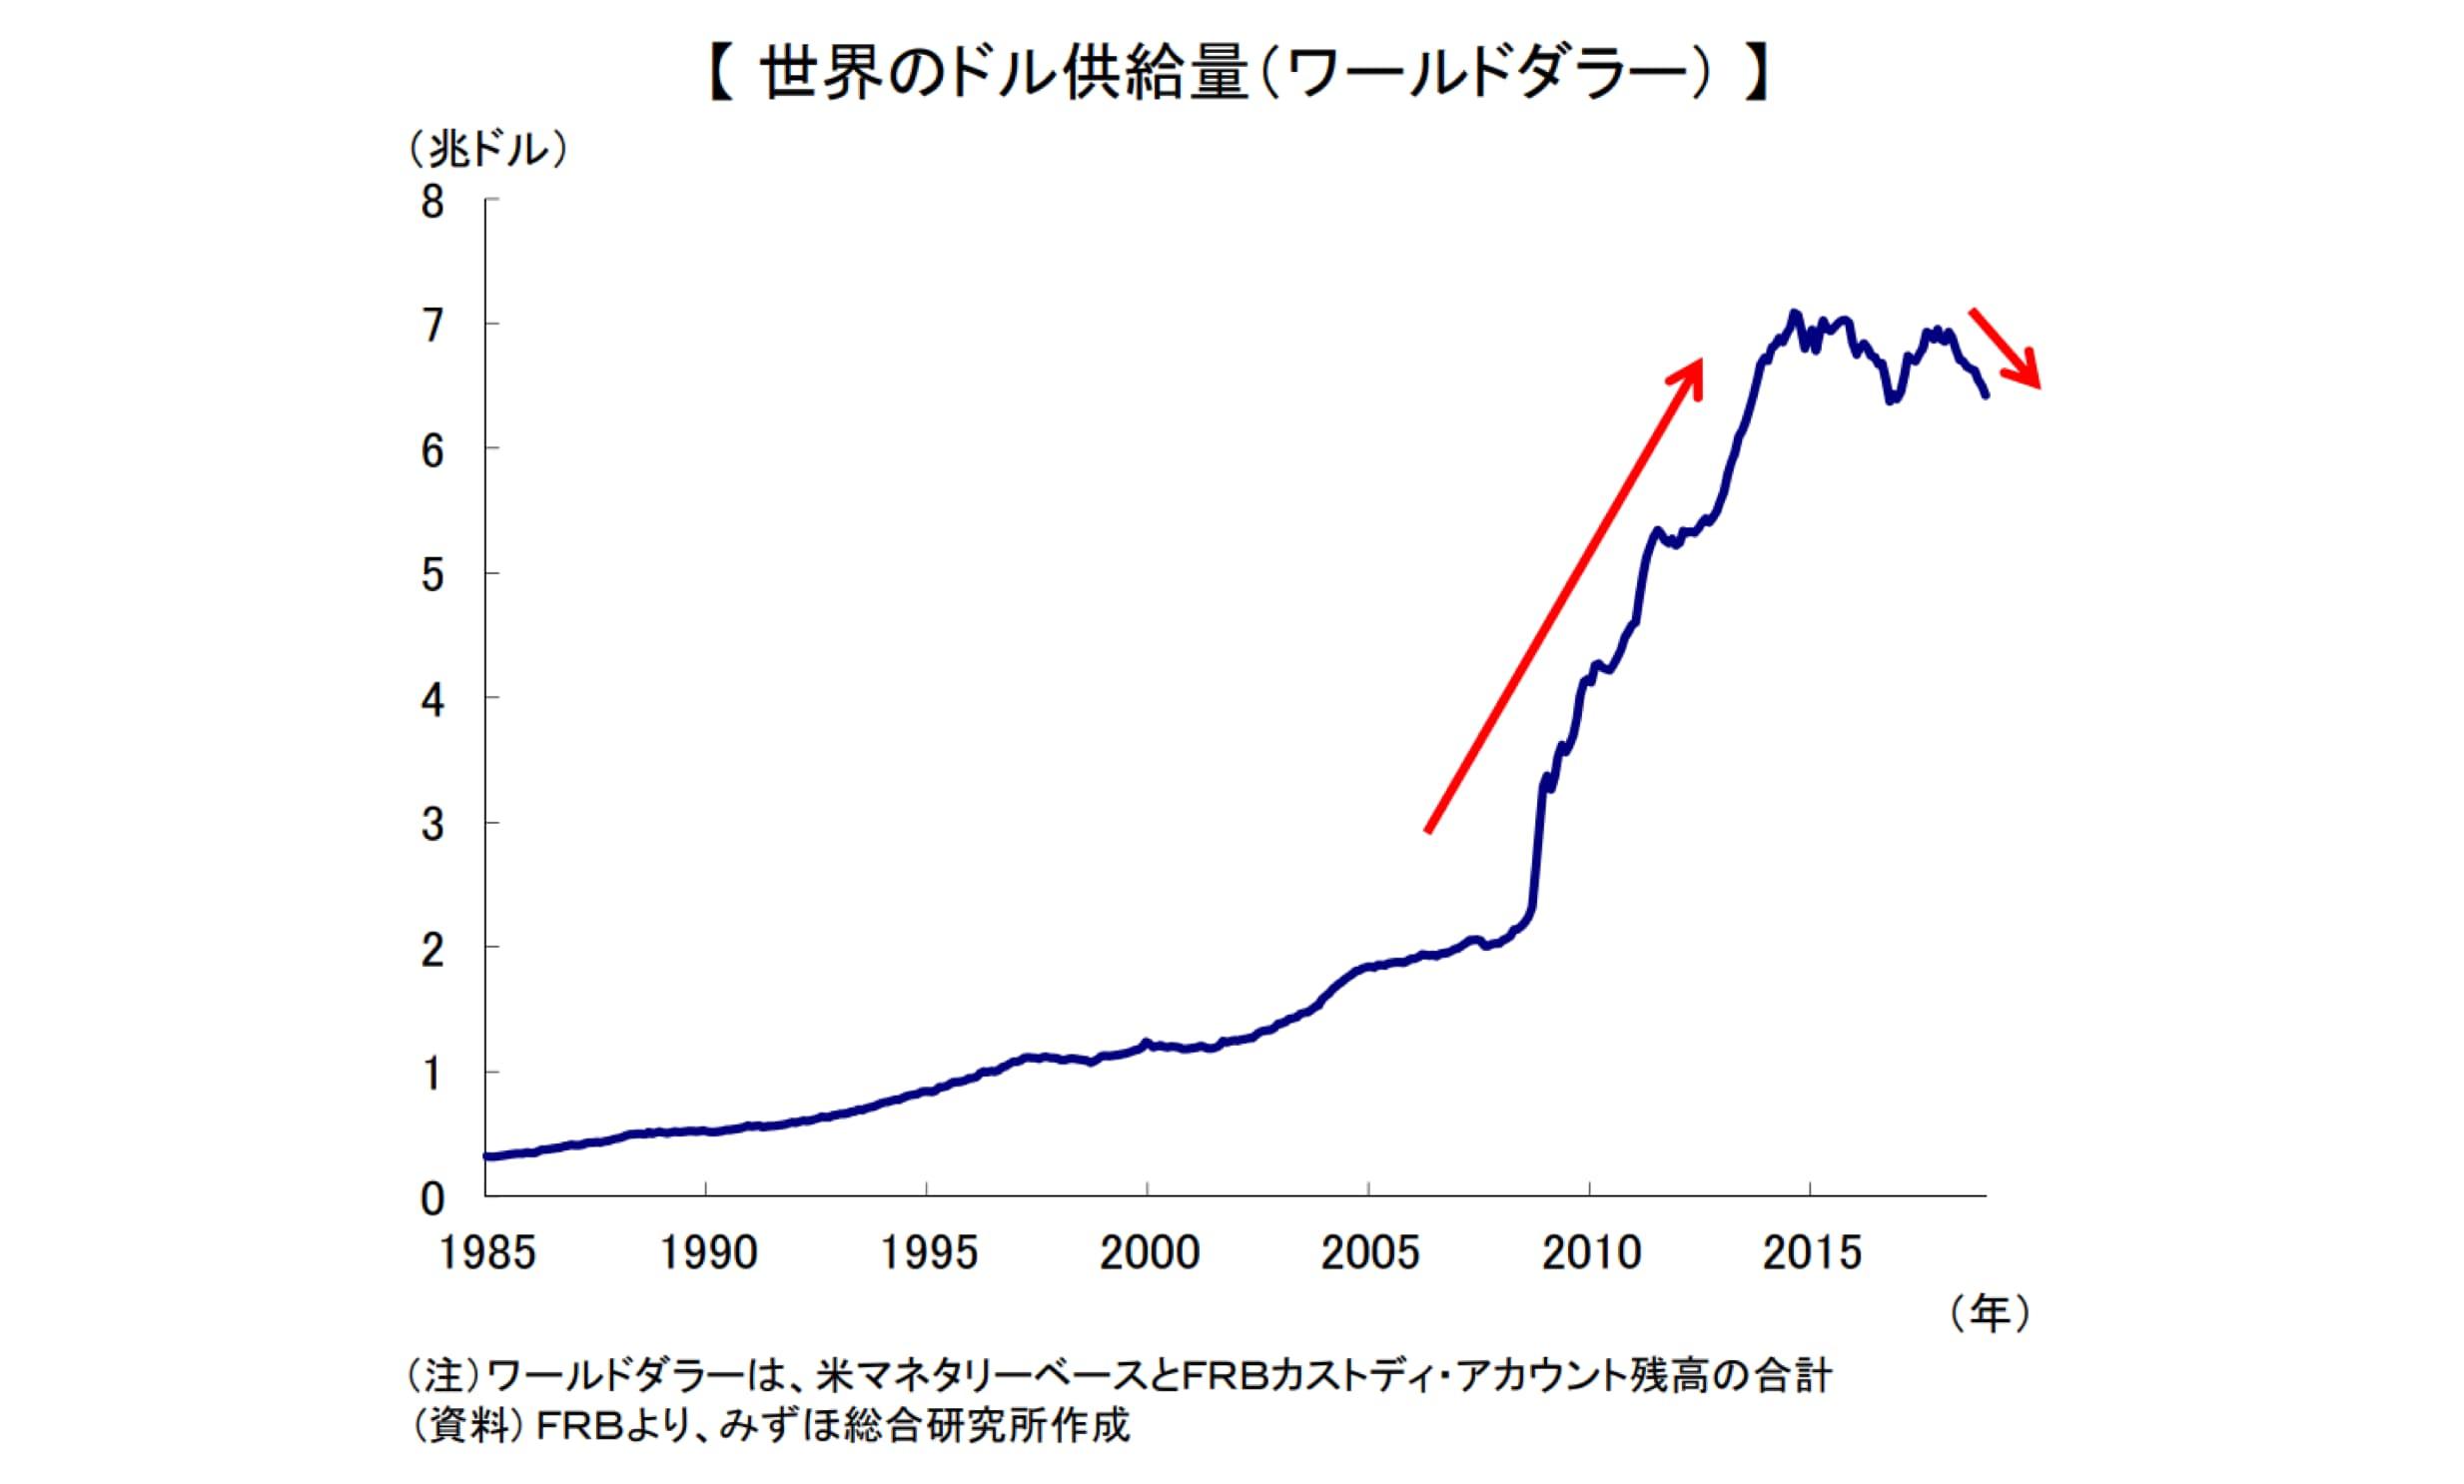 https://www.boj.or.jp/announcements/education/oshiete/history/j12.htm/